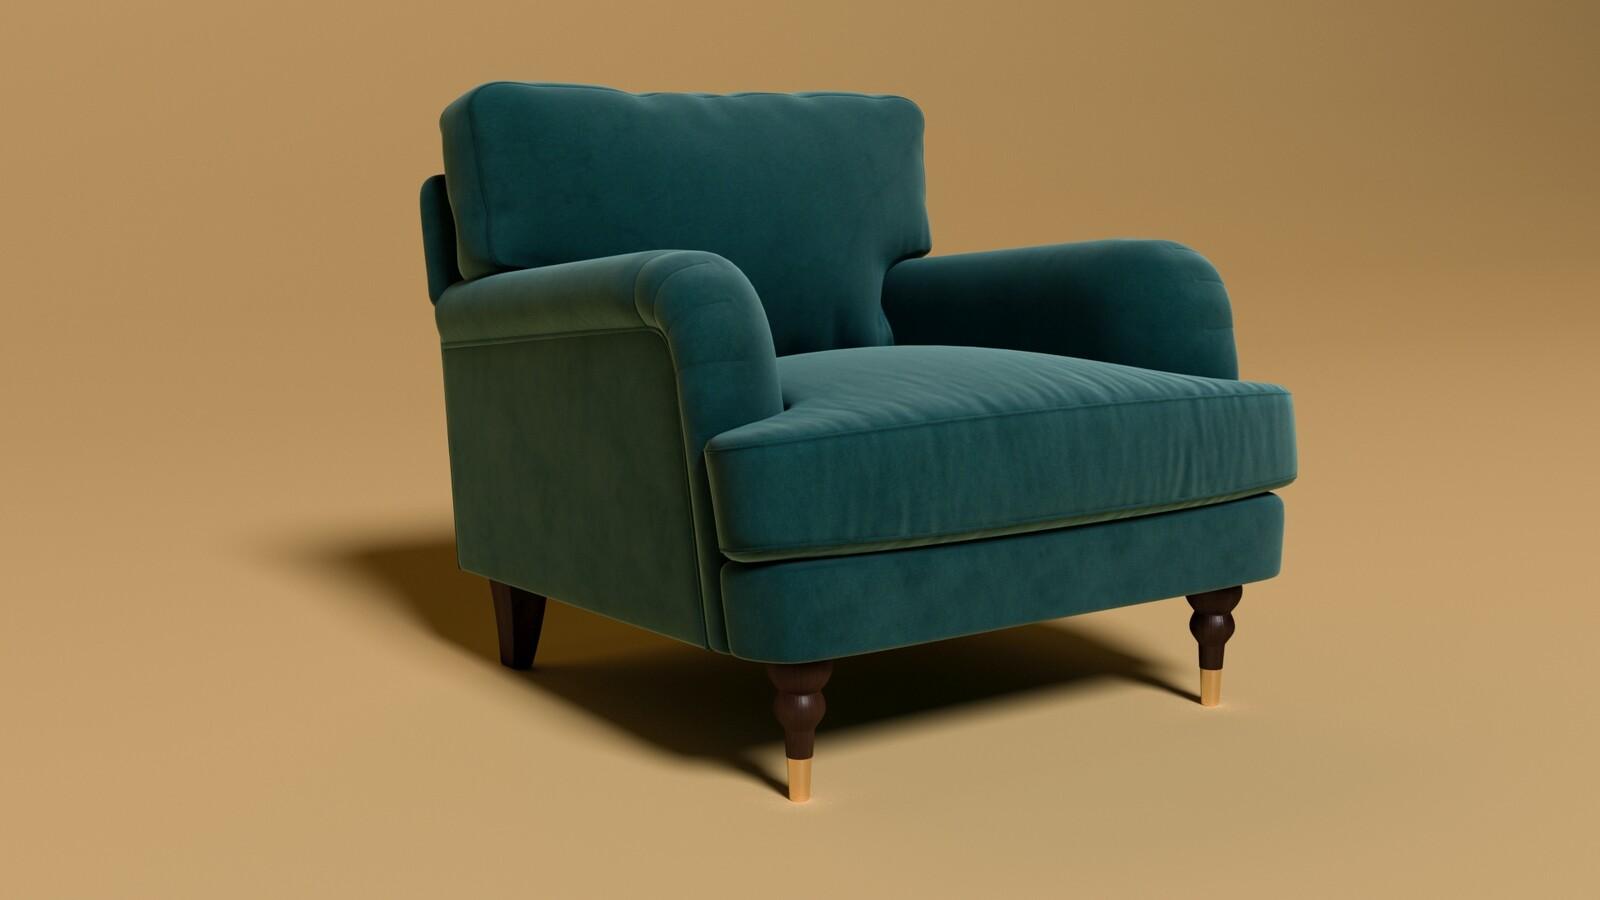 Charlbury Armchair in Kingfisher Velvet. - Rendered in Corona Renderer.